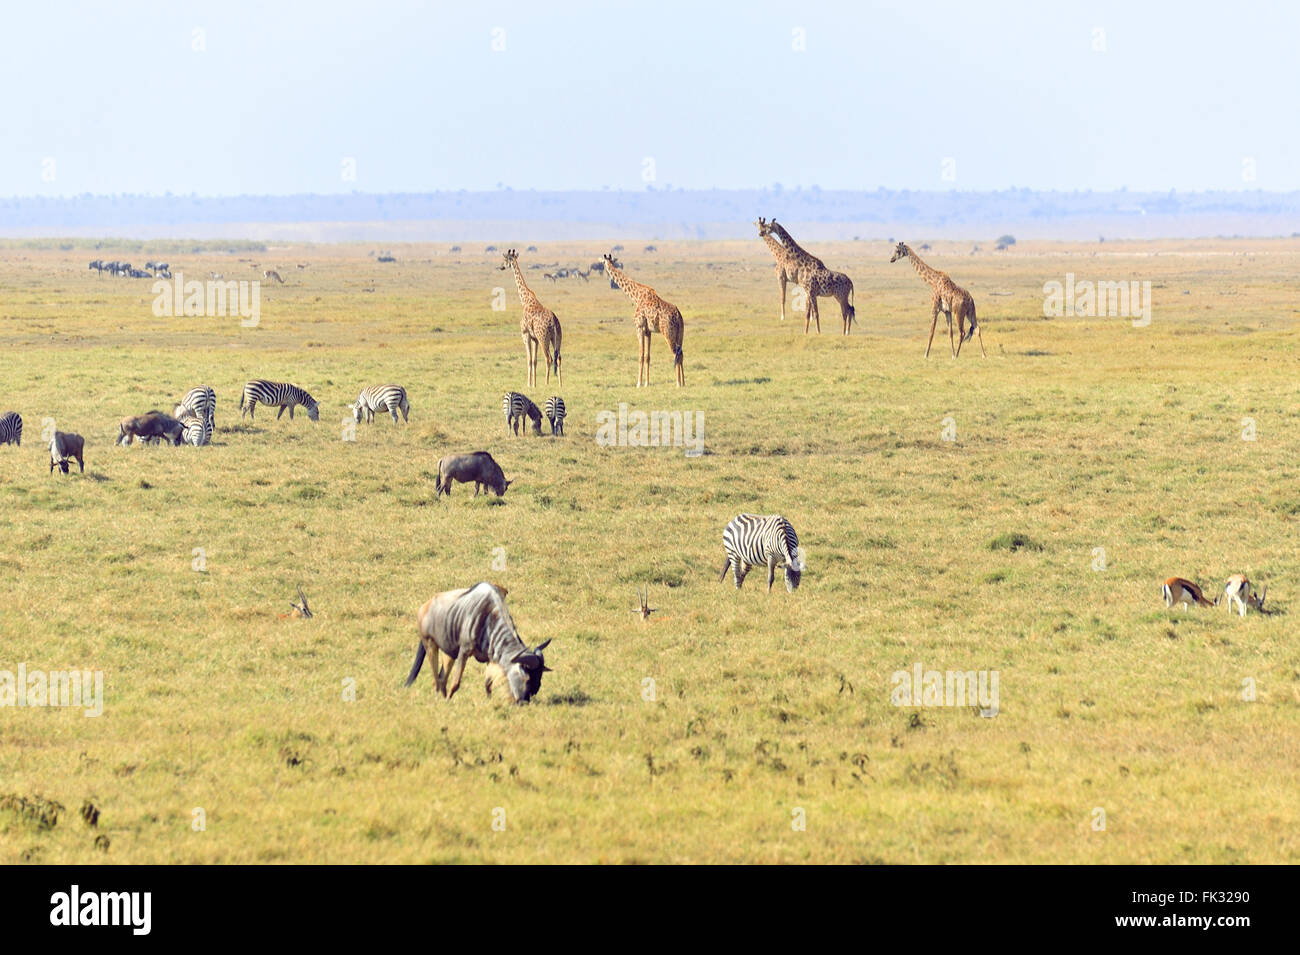 Savane Africaine avec des animaux différents, au Kenya Photo Stock